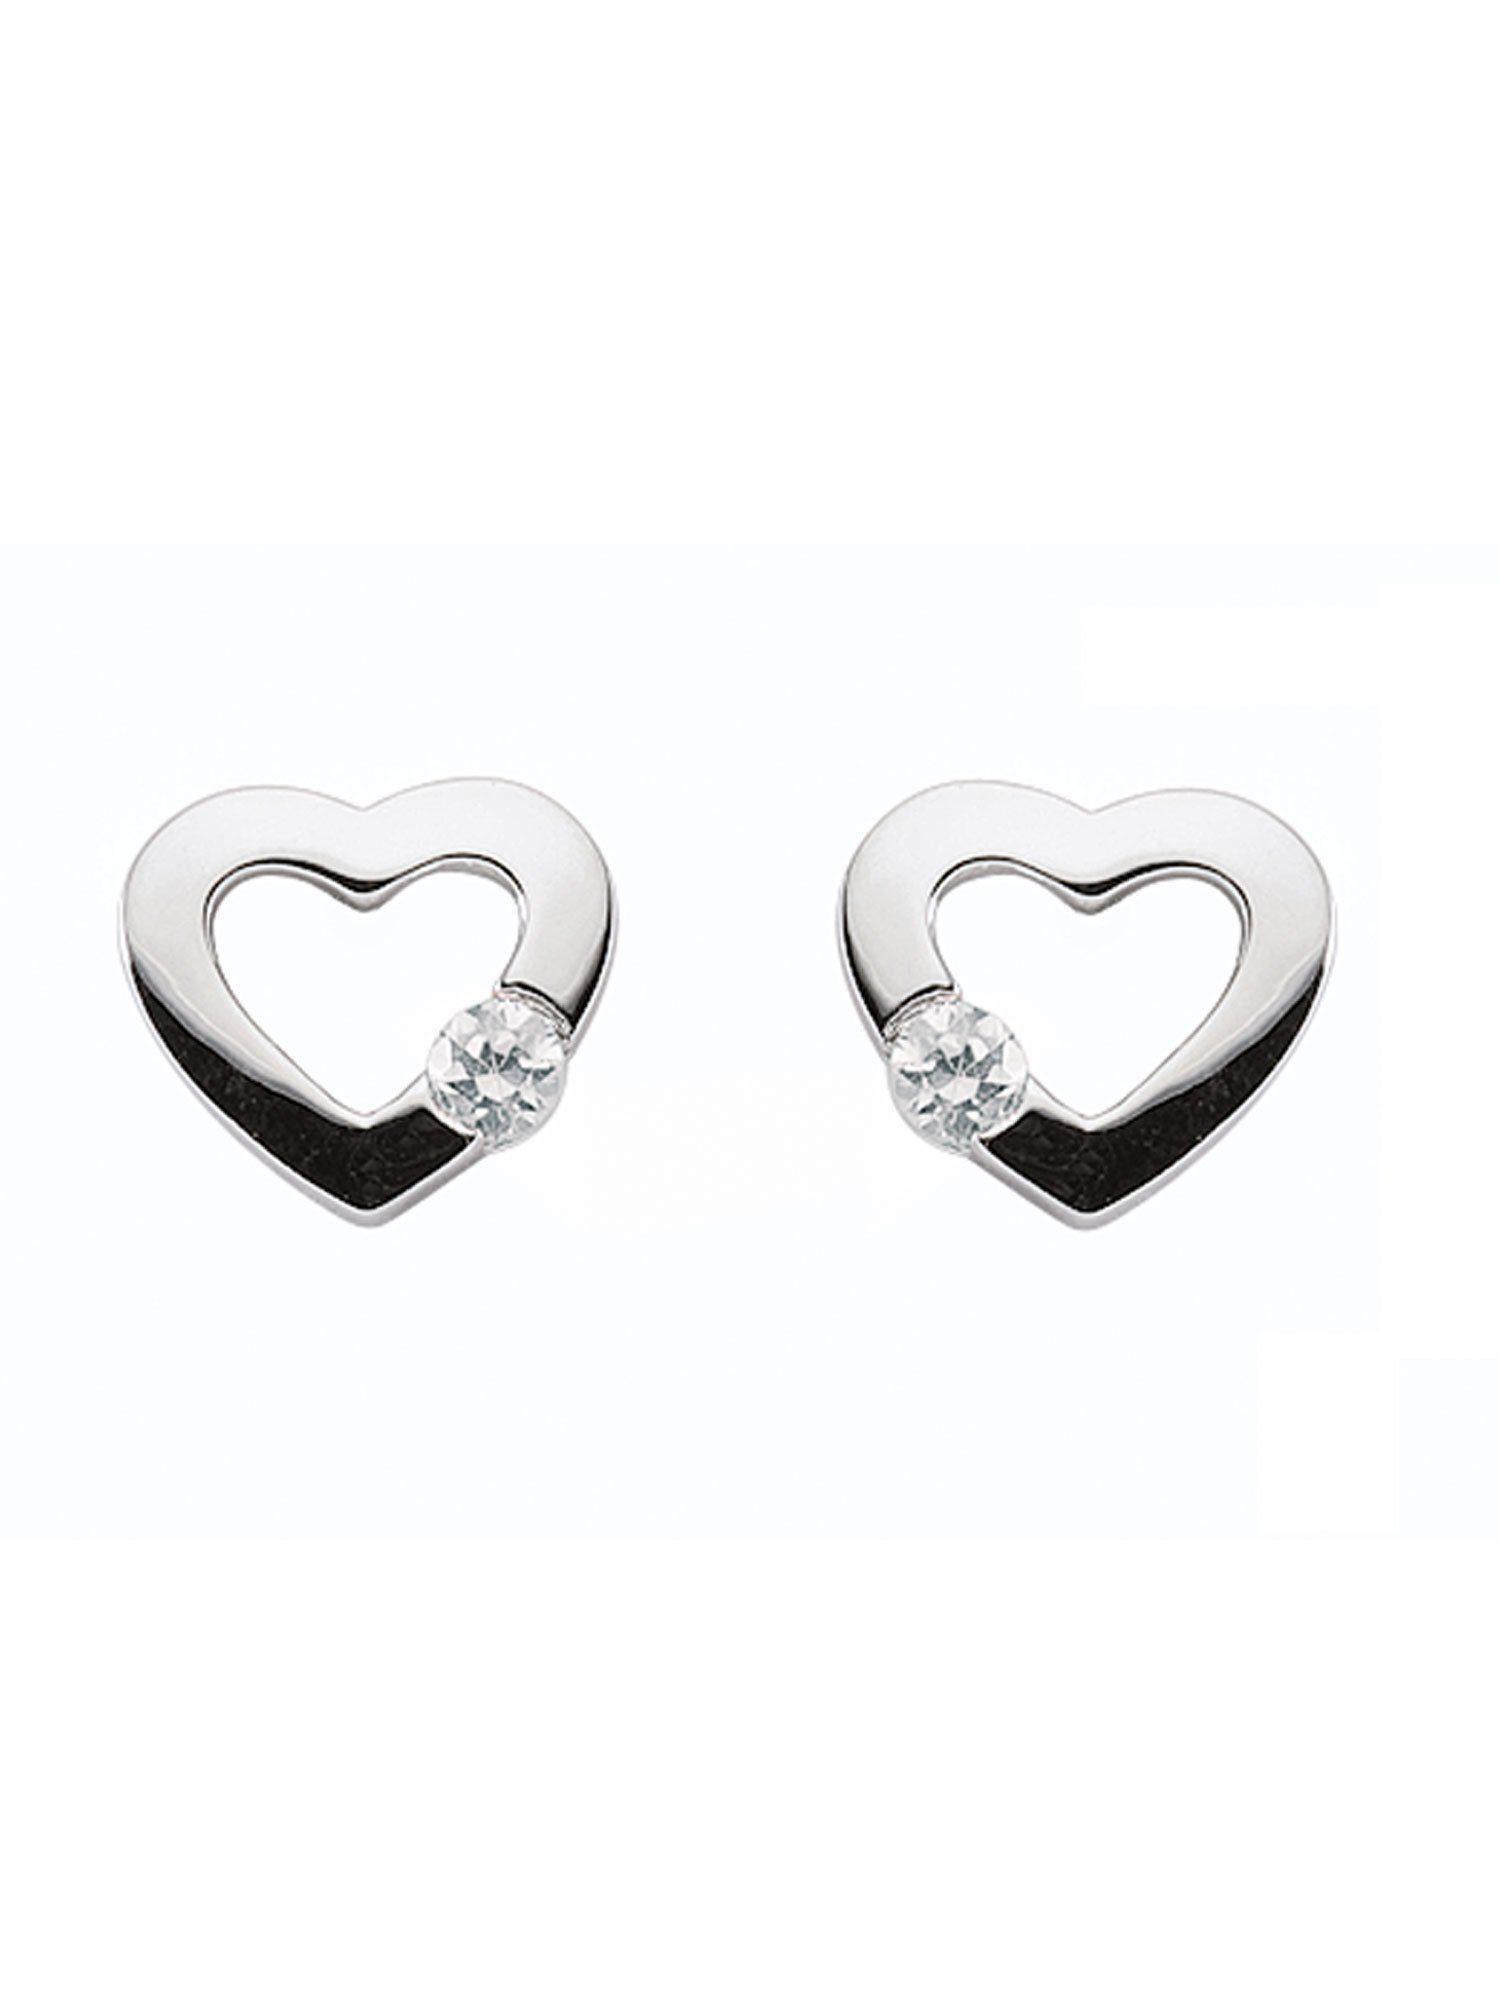 925 Sterling Silber /& Ohrringe Ohrstecker Herz Herz